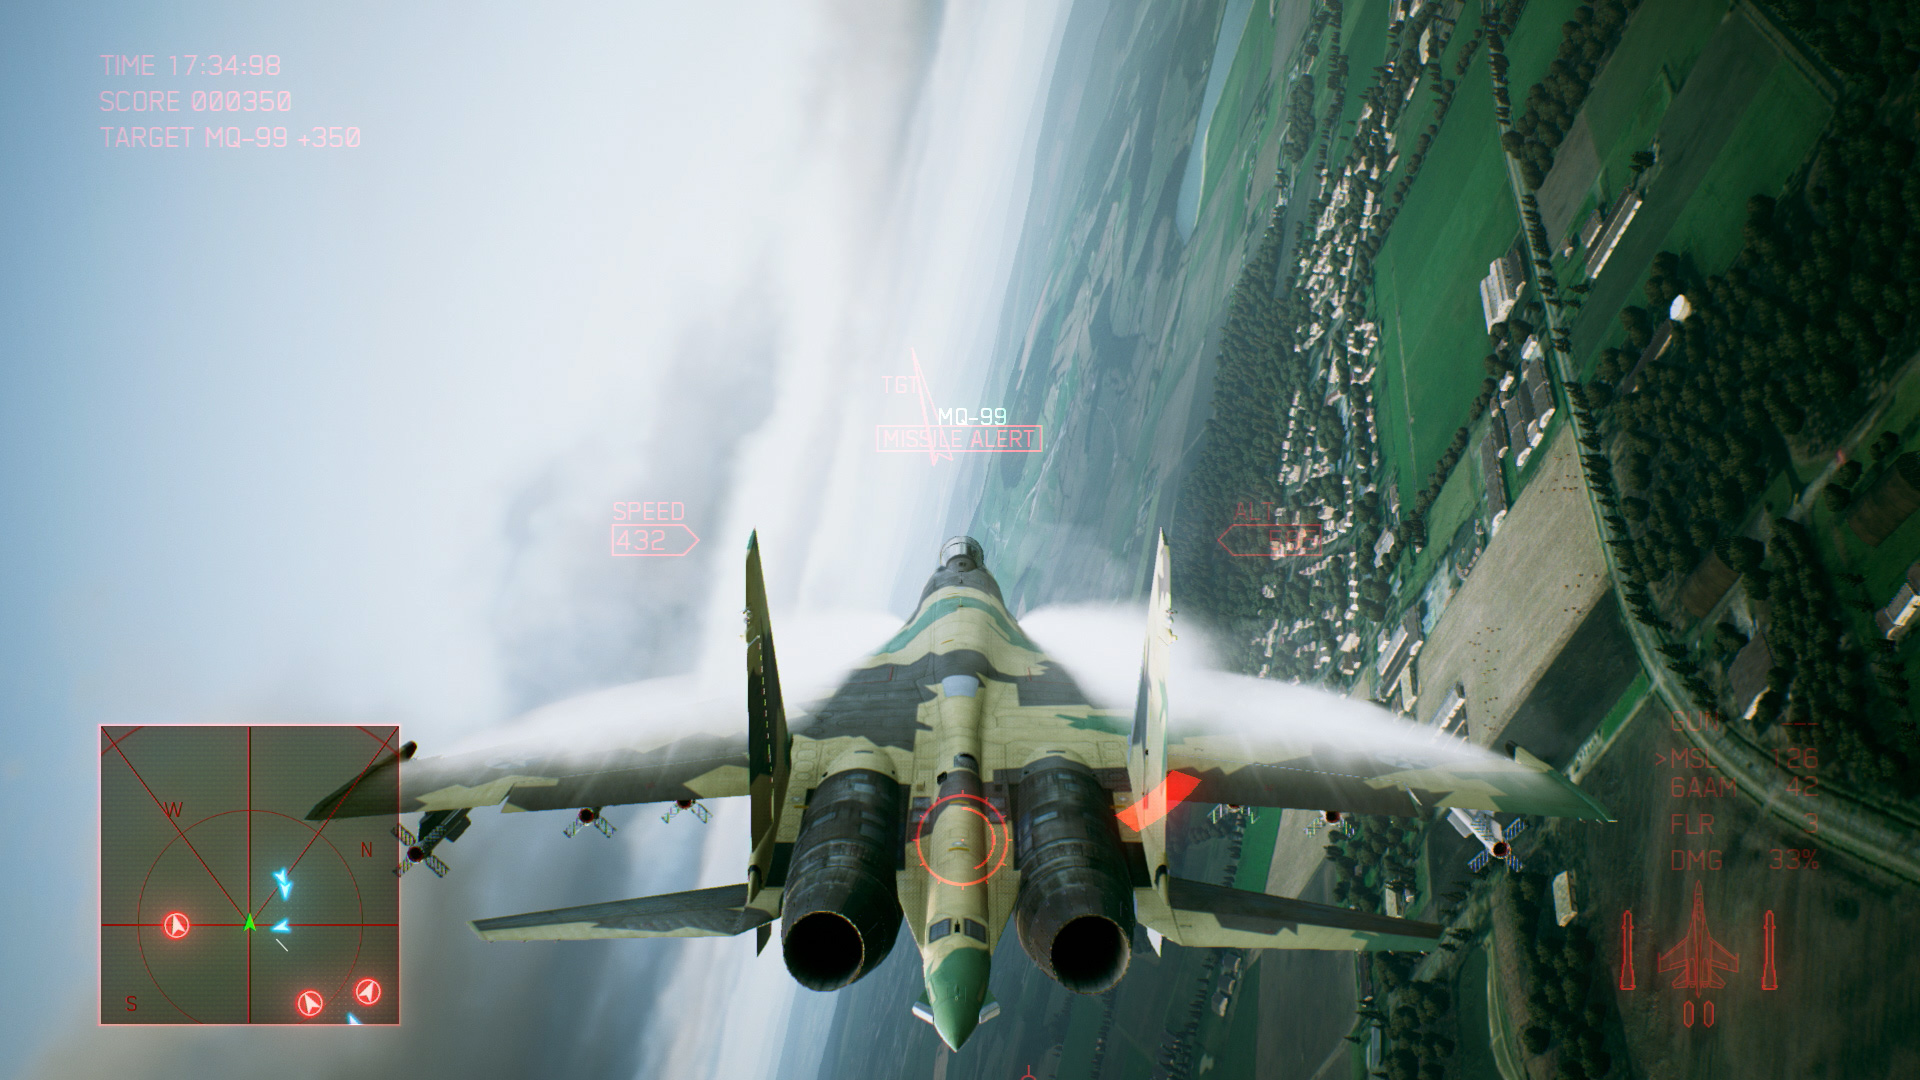 http://www.idgtv.es/archivos/201806/ace-combat-7-skies-unknown-img3.jpg